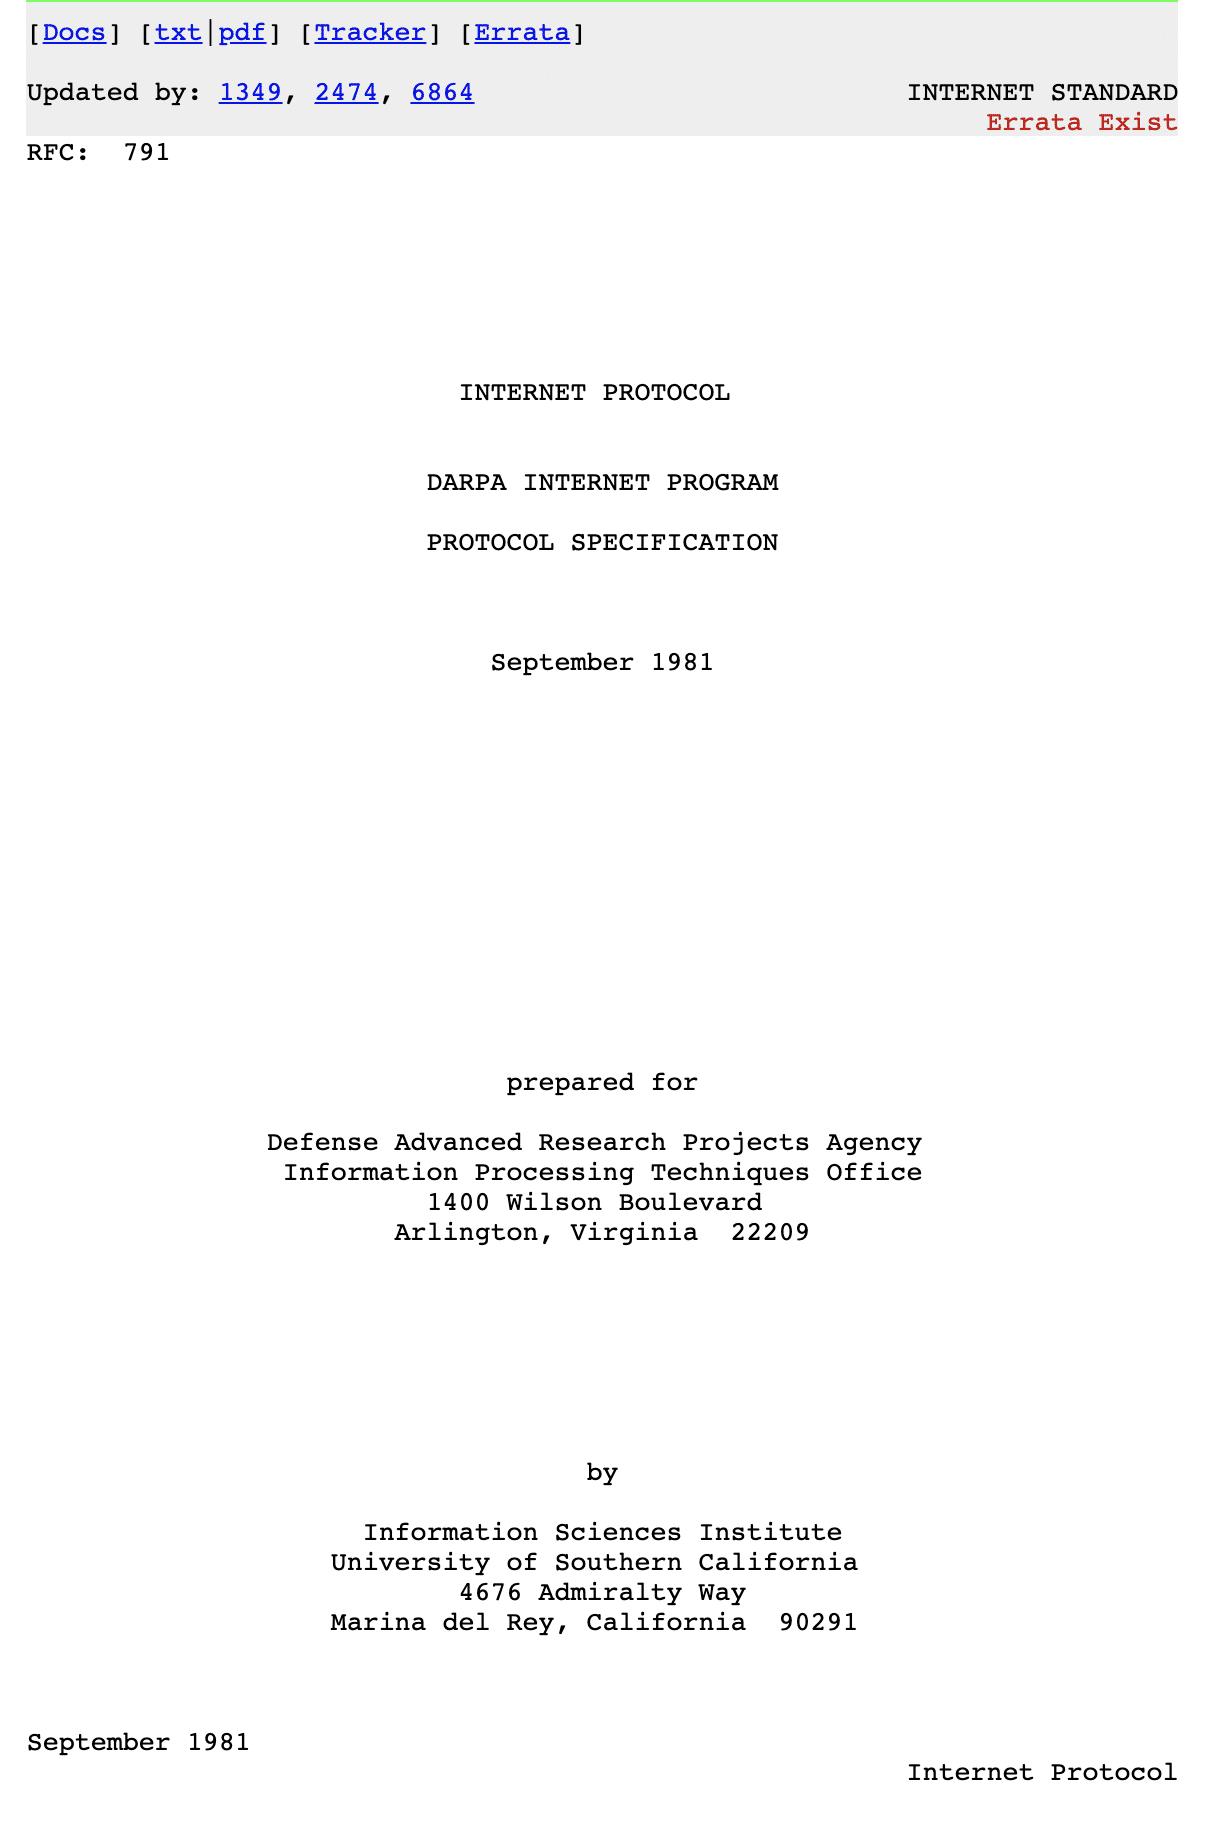 Internet Protokol (RFC791)